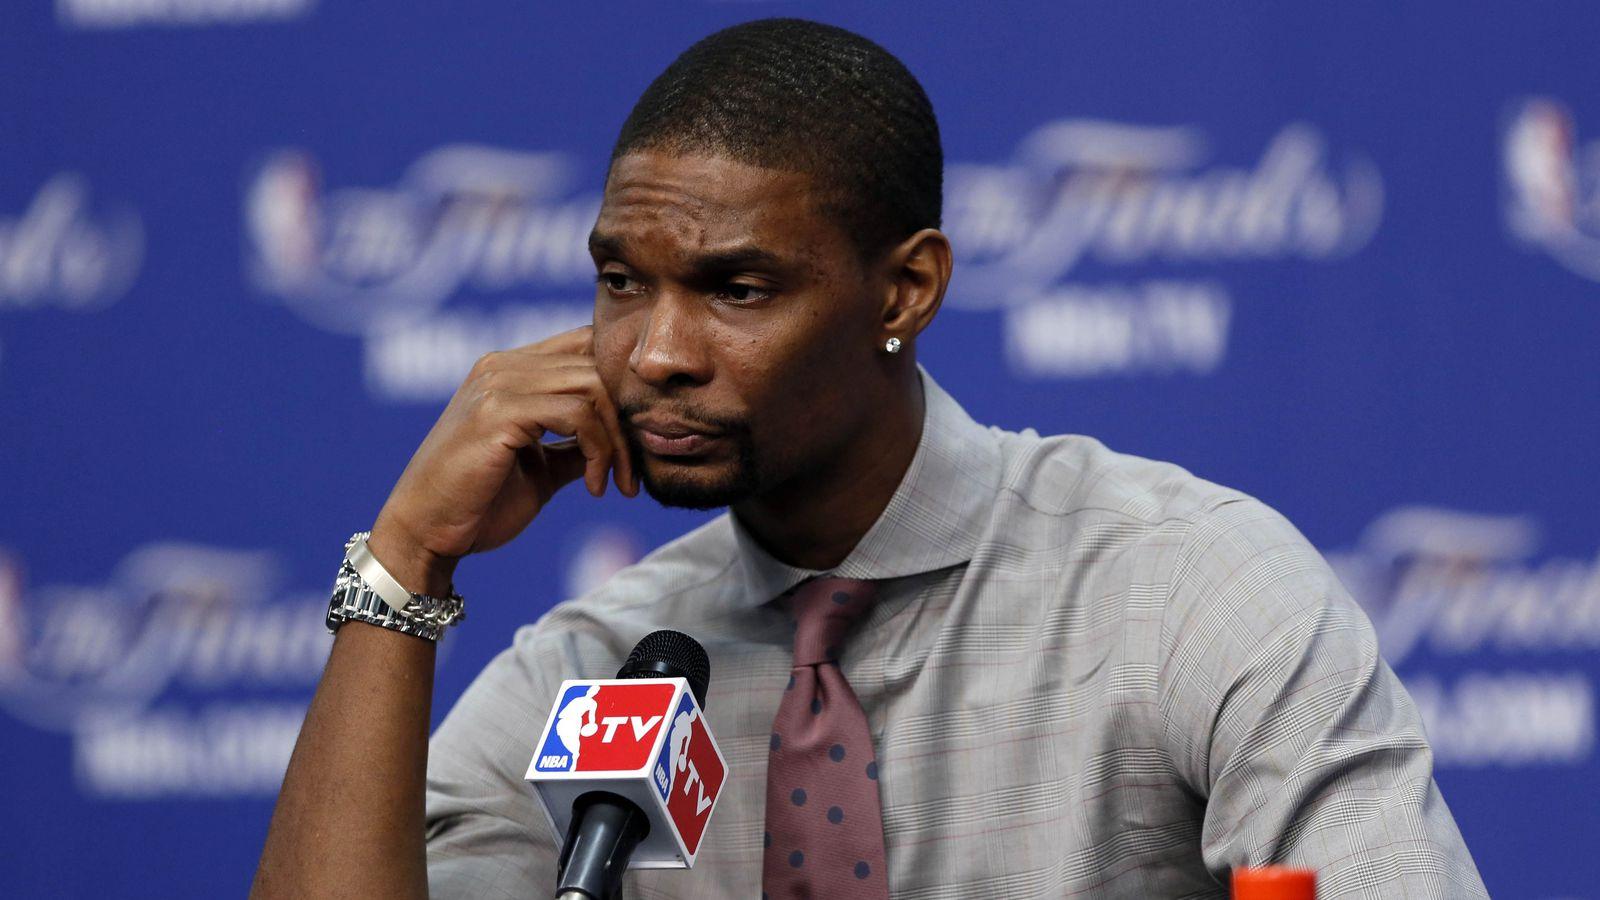 NBA Finals 2013: Chris Bosh tired of trade rumors, wants to retire in Miami - SBNation.com